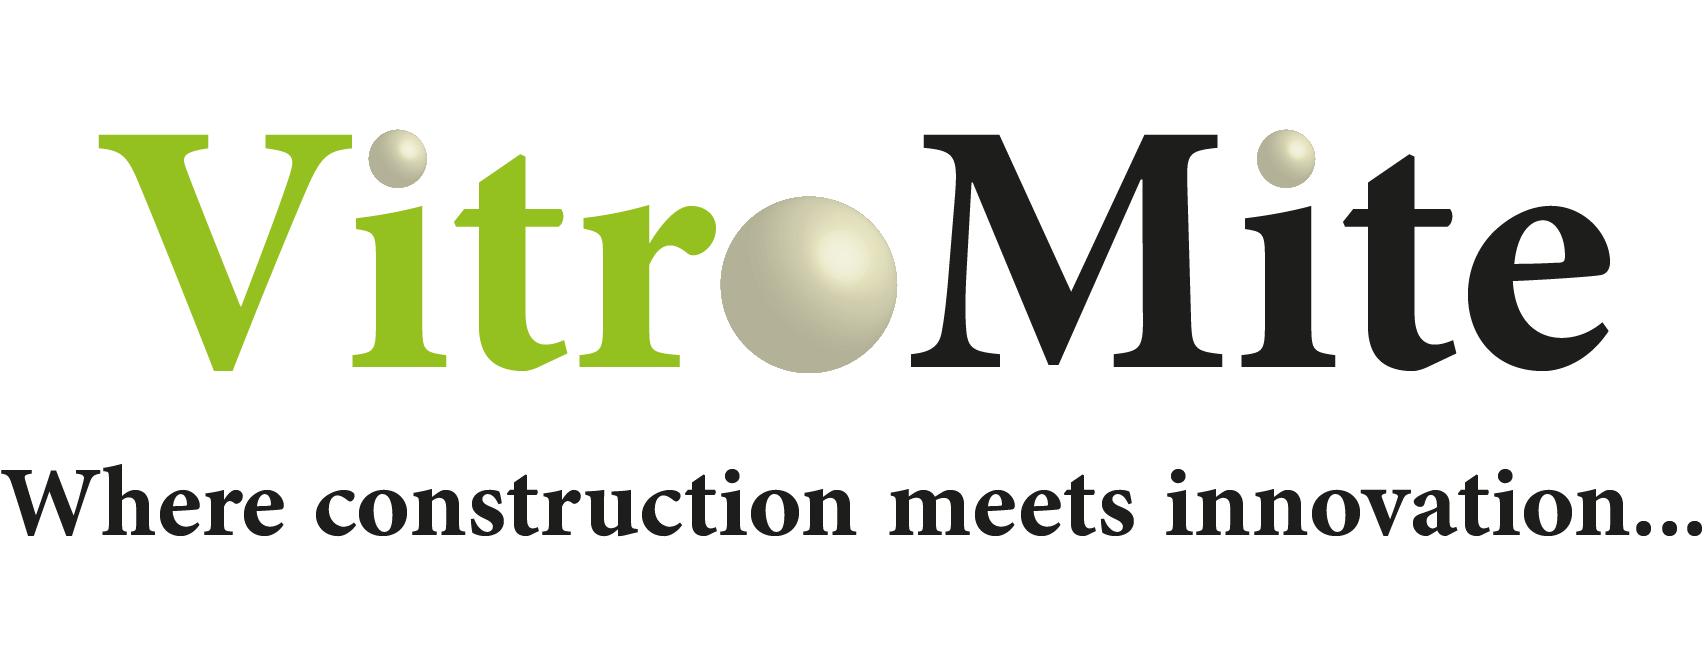 Vitromite logo